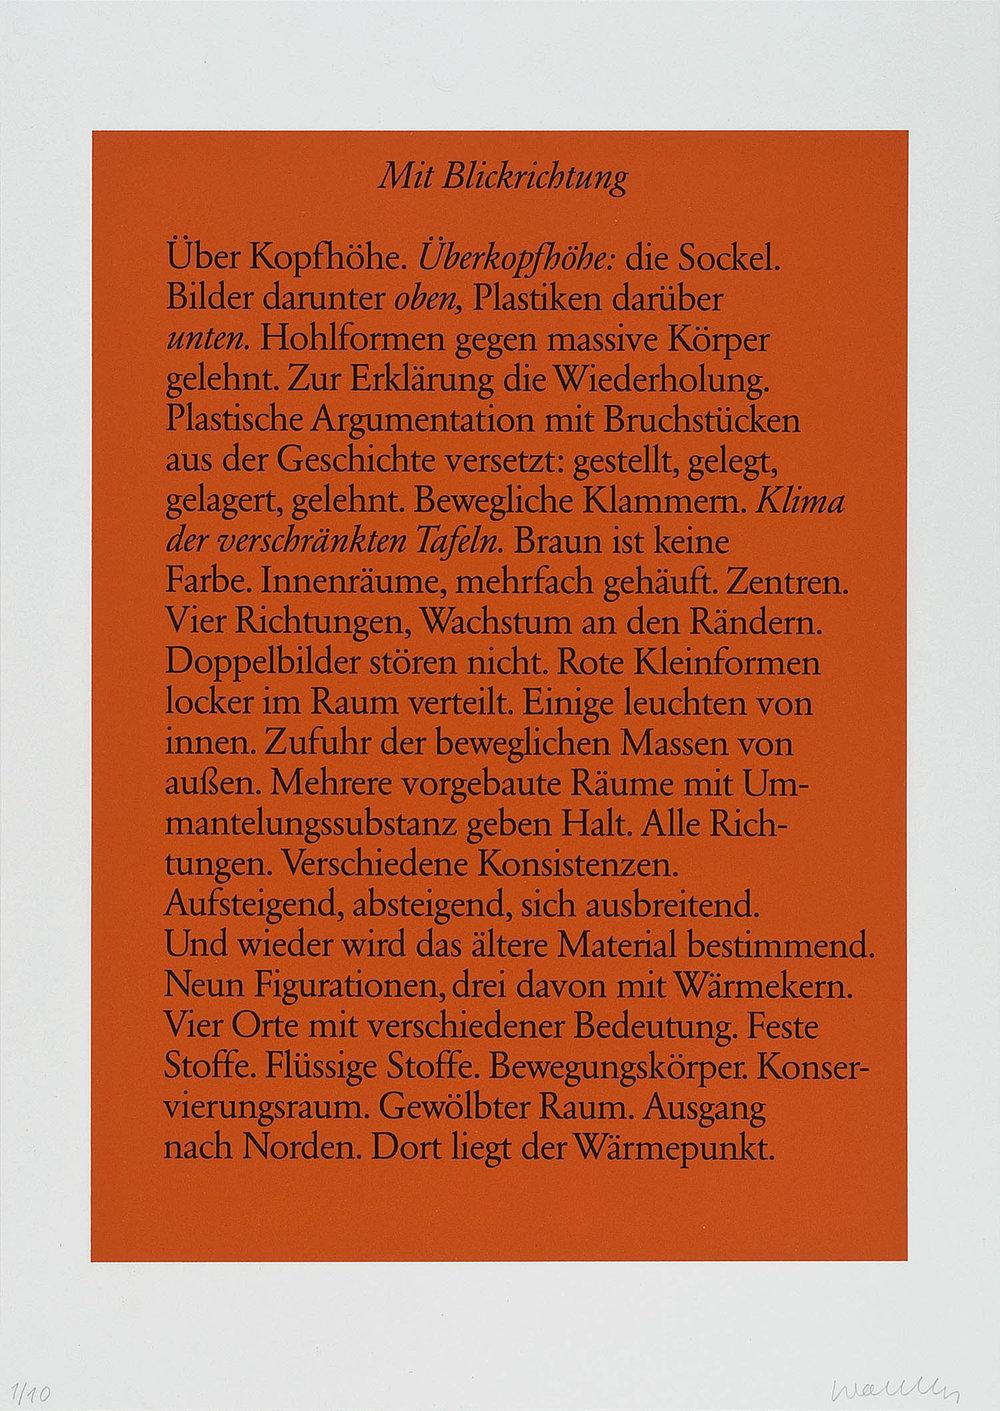 o.T. (Mit Blickrichtung) | 1986 | Lithographie | 60 x 42 cm